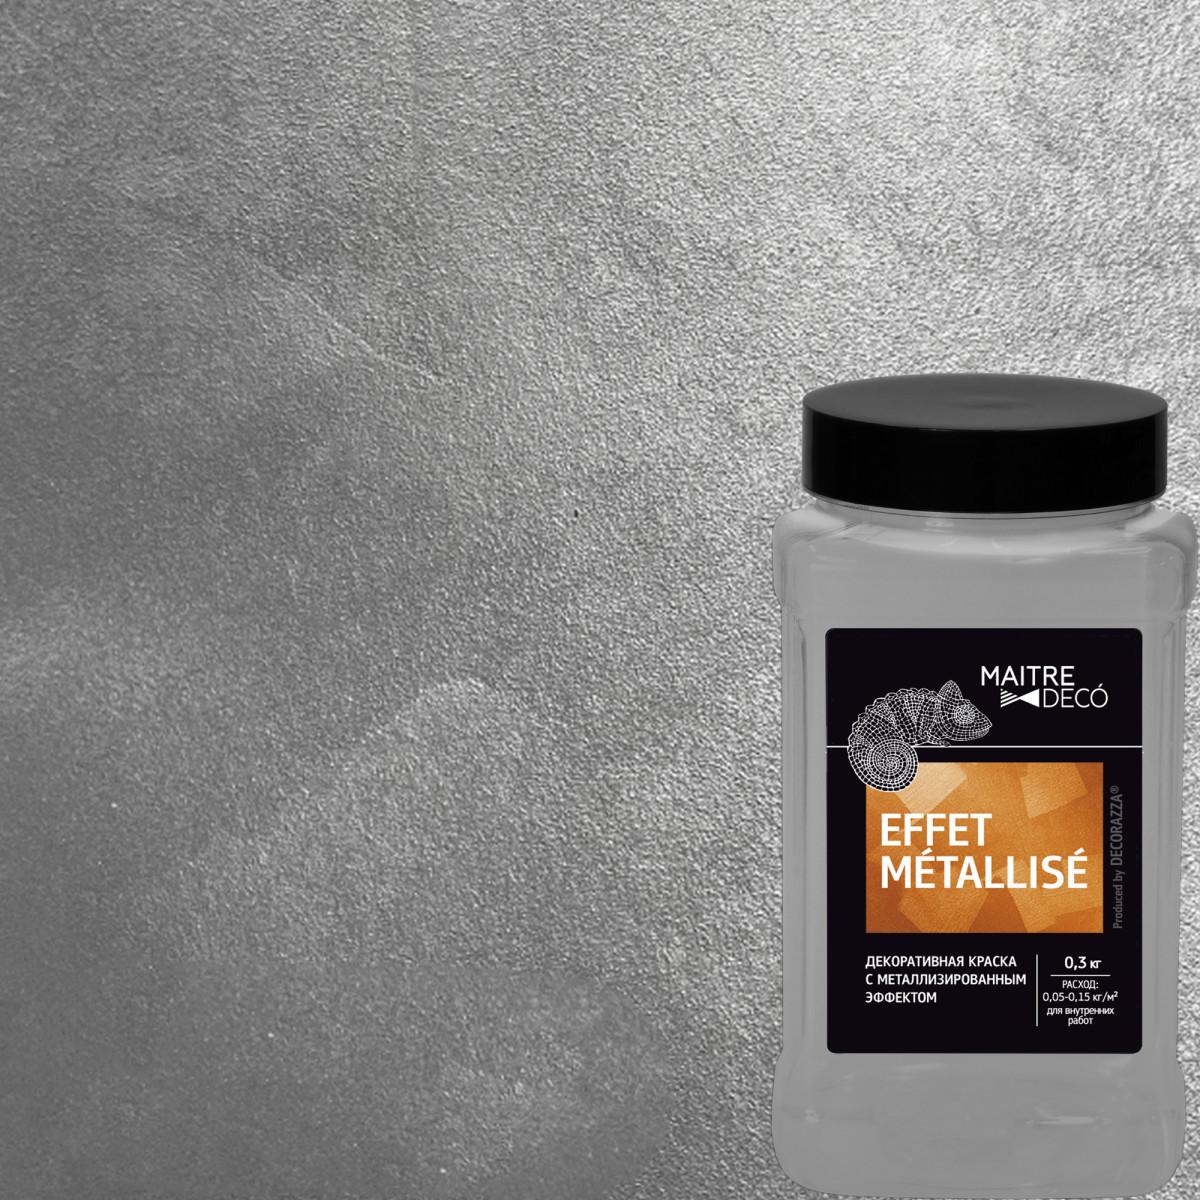 Декоративная краска Maitre Deco «Effet Metallise Argent» эффект металла 0.3 кг